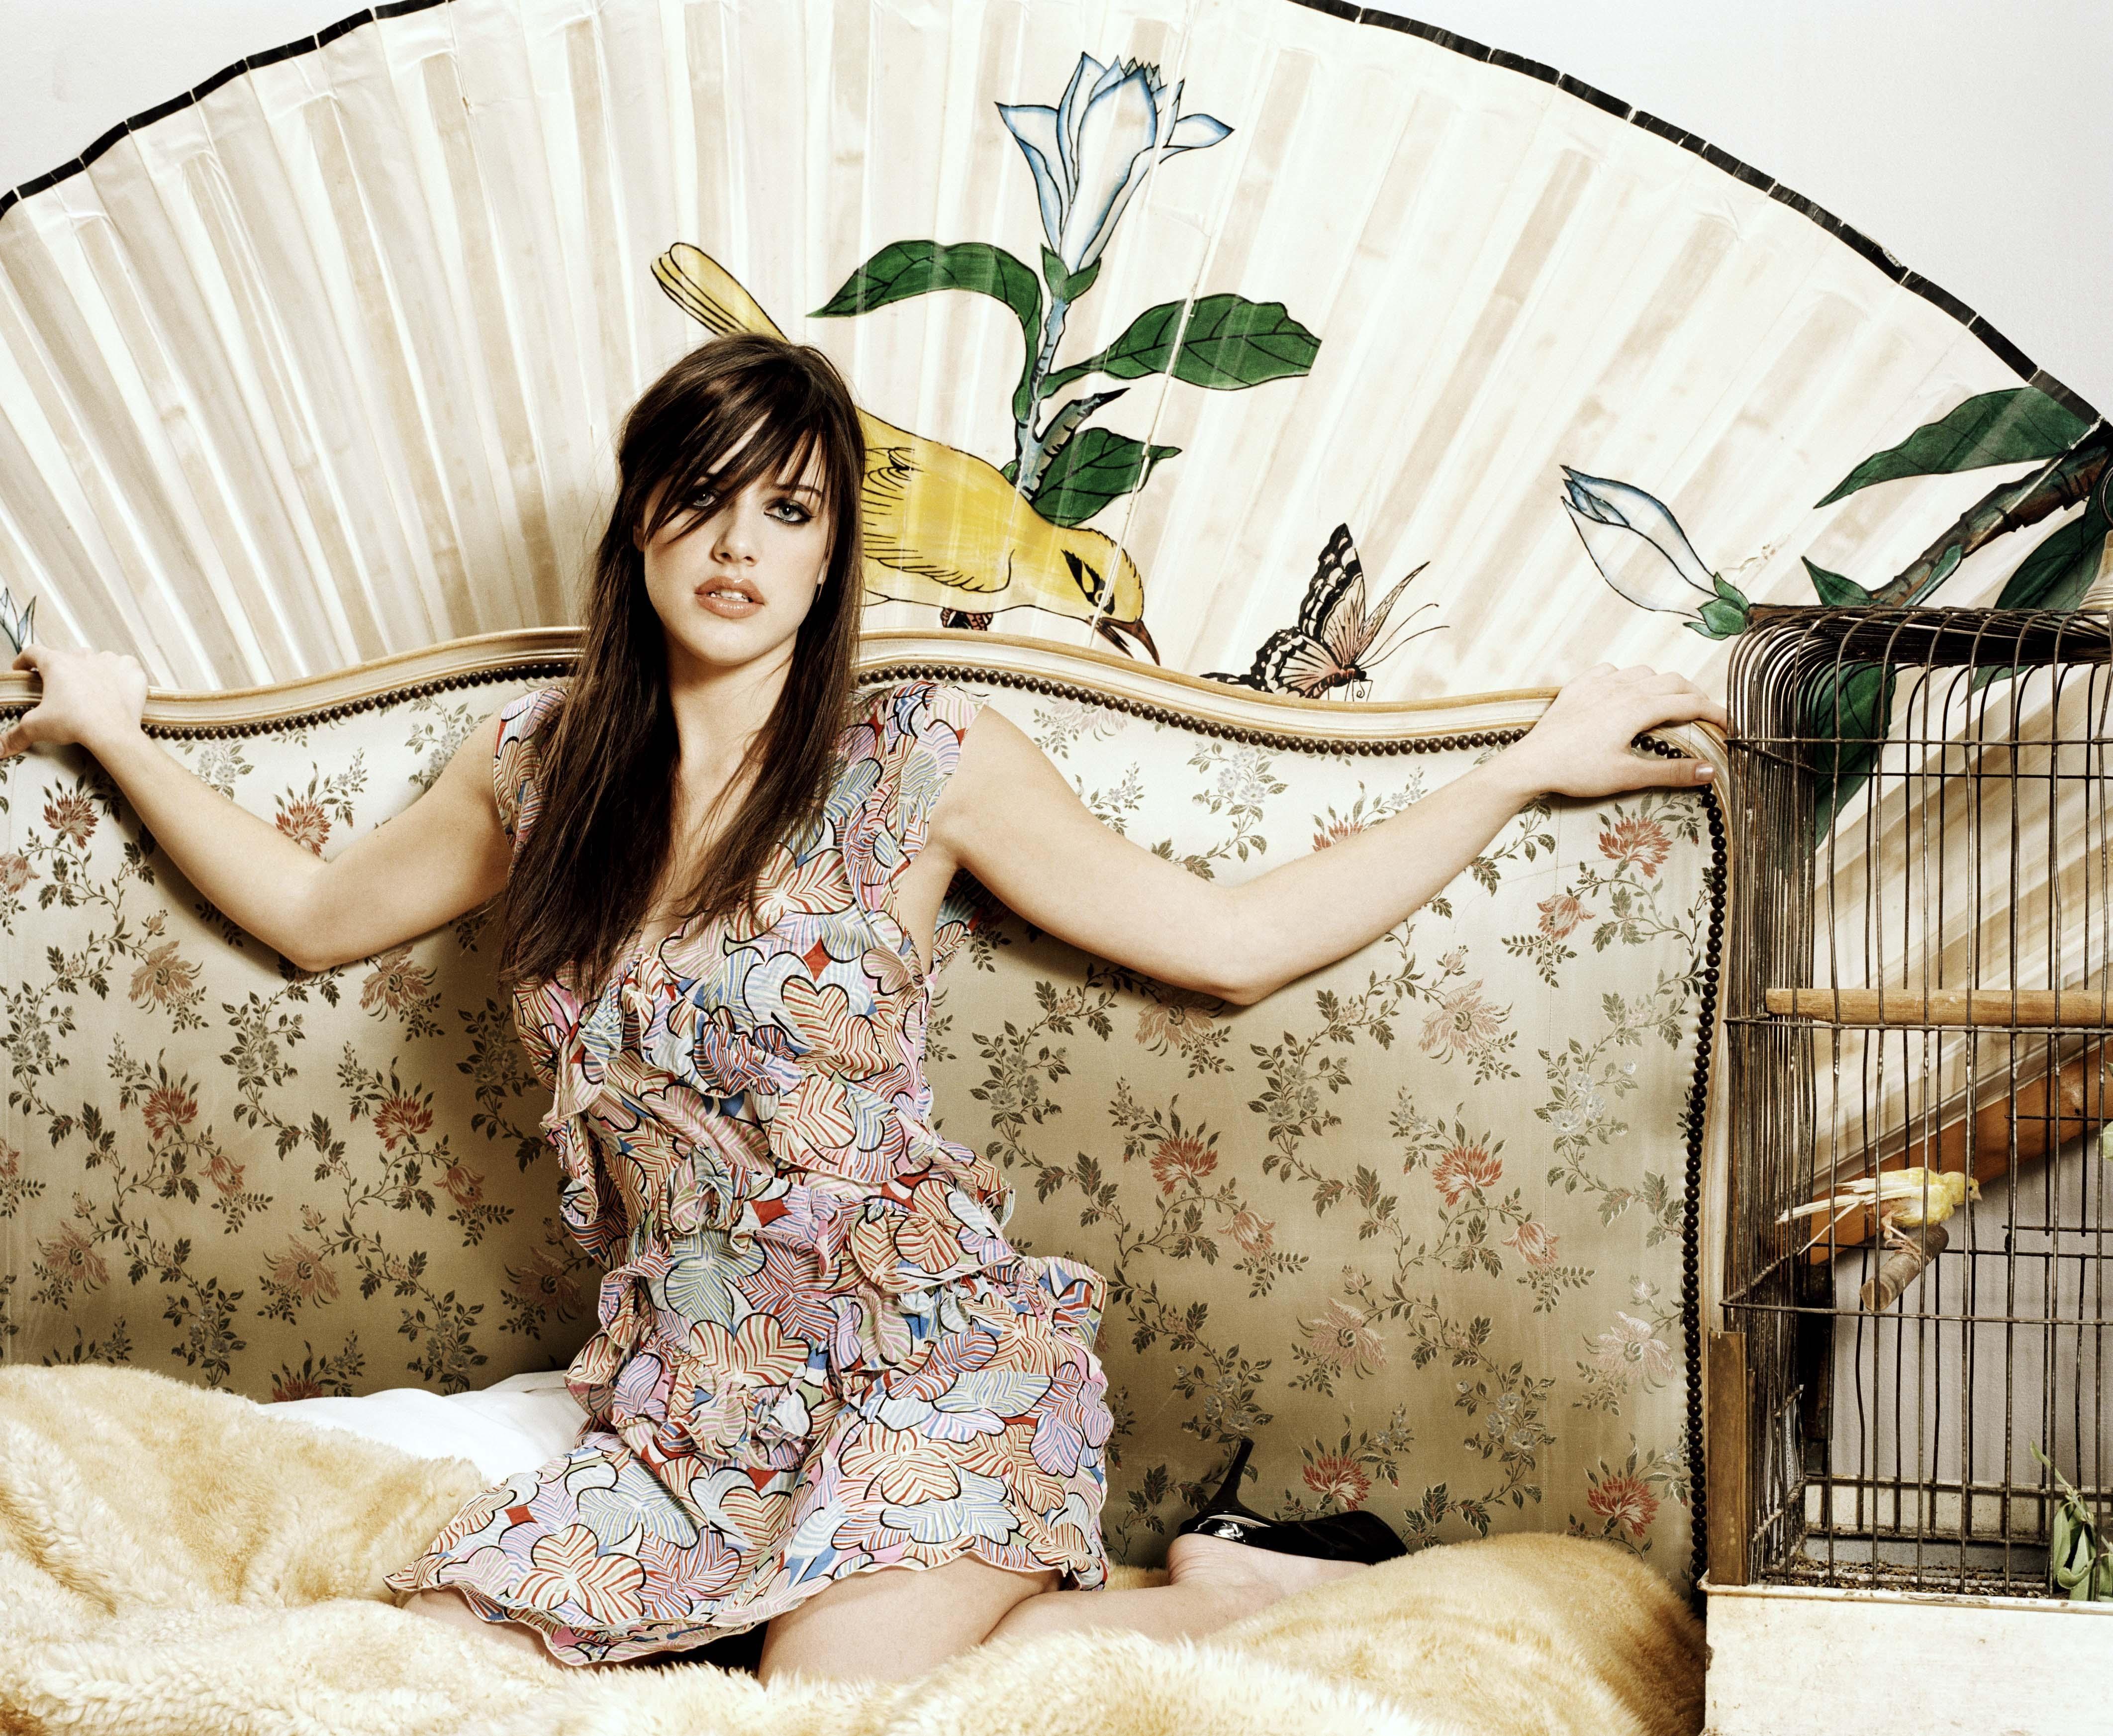 pics Blythe Duff (born 1962)